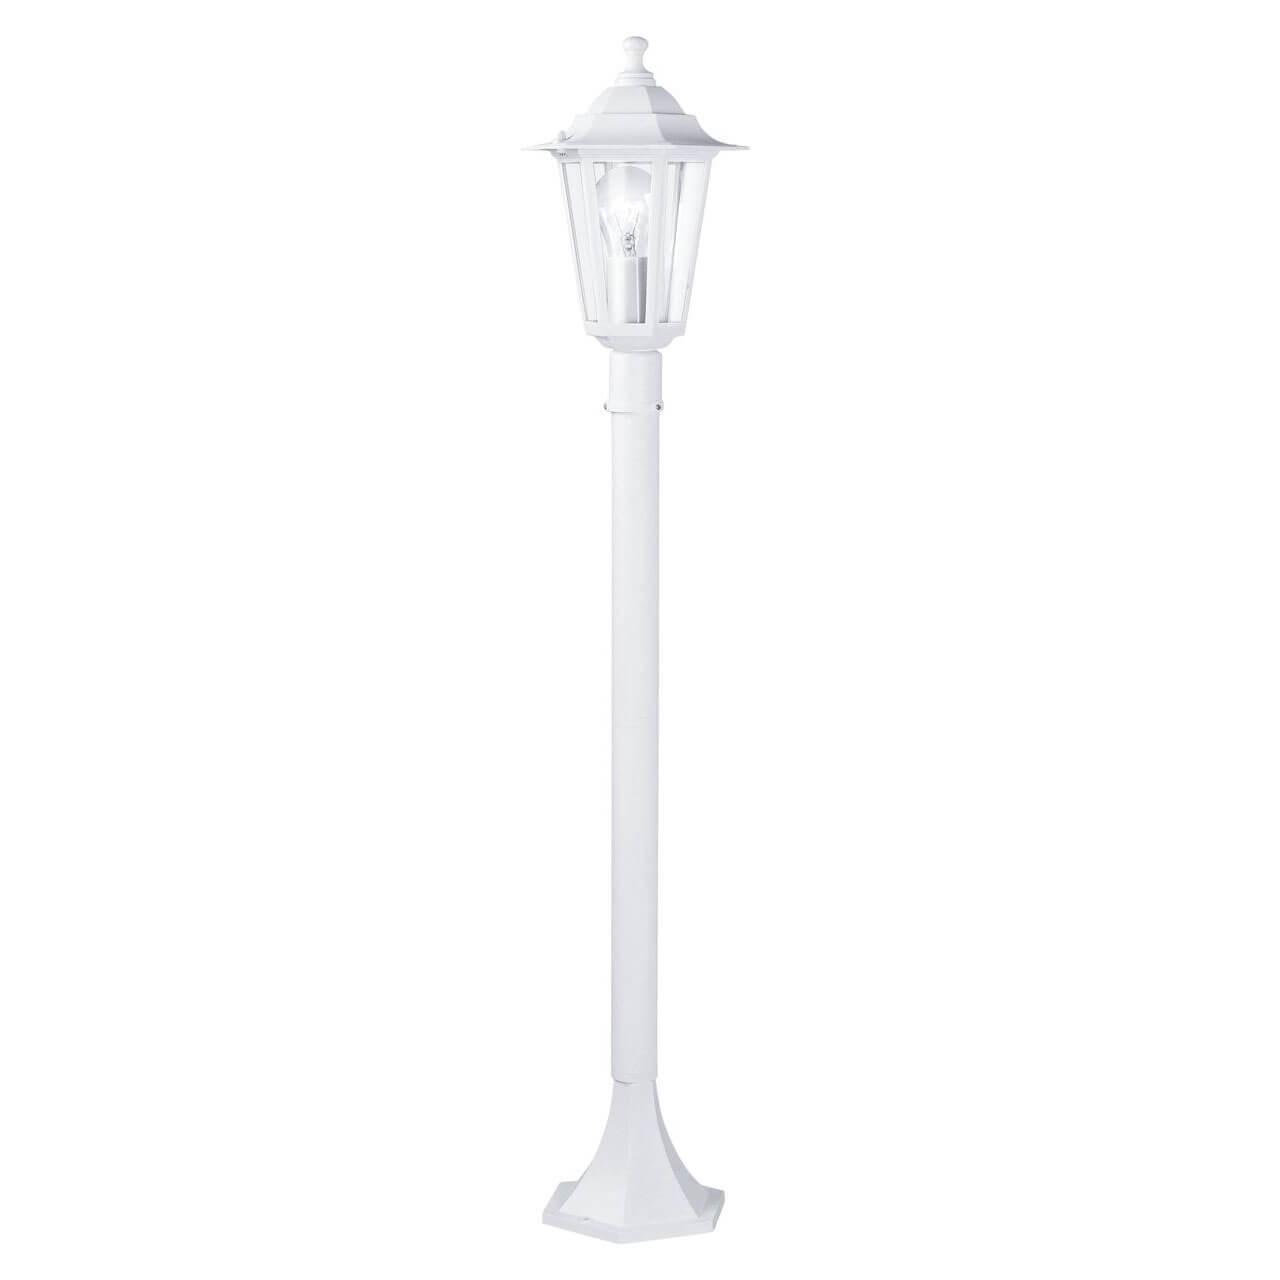 Светильник Eglo 22995 Laterna цена 2017